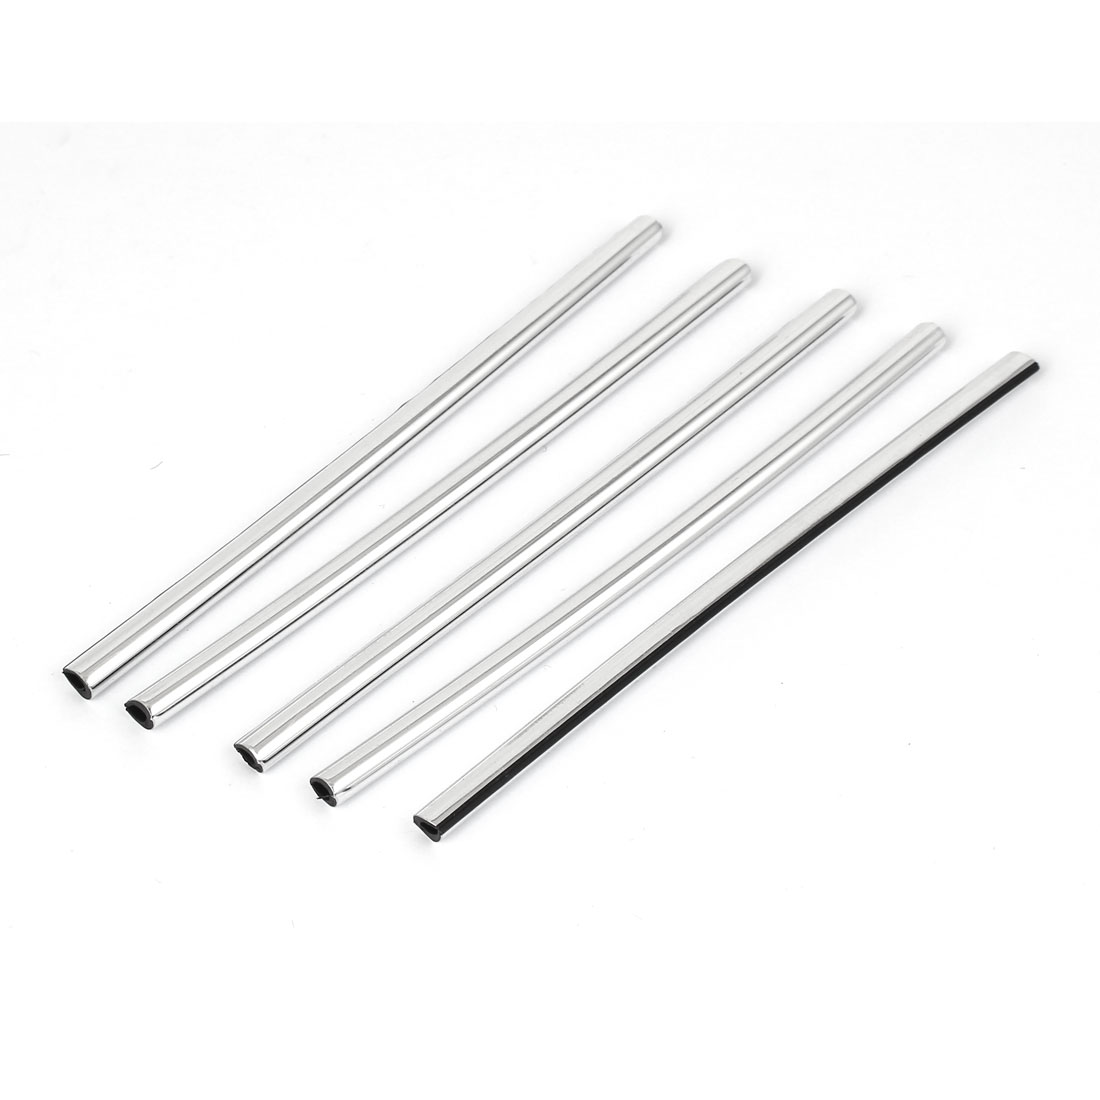 Car Door Window Air Outlet Rubber Seal Strip Chrome Edge Trim Silver Tone 5 Pcs